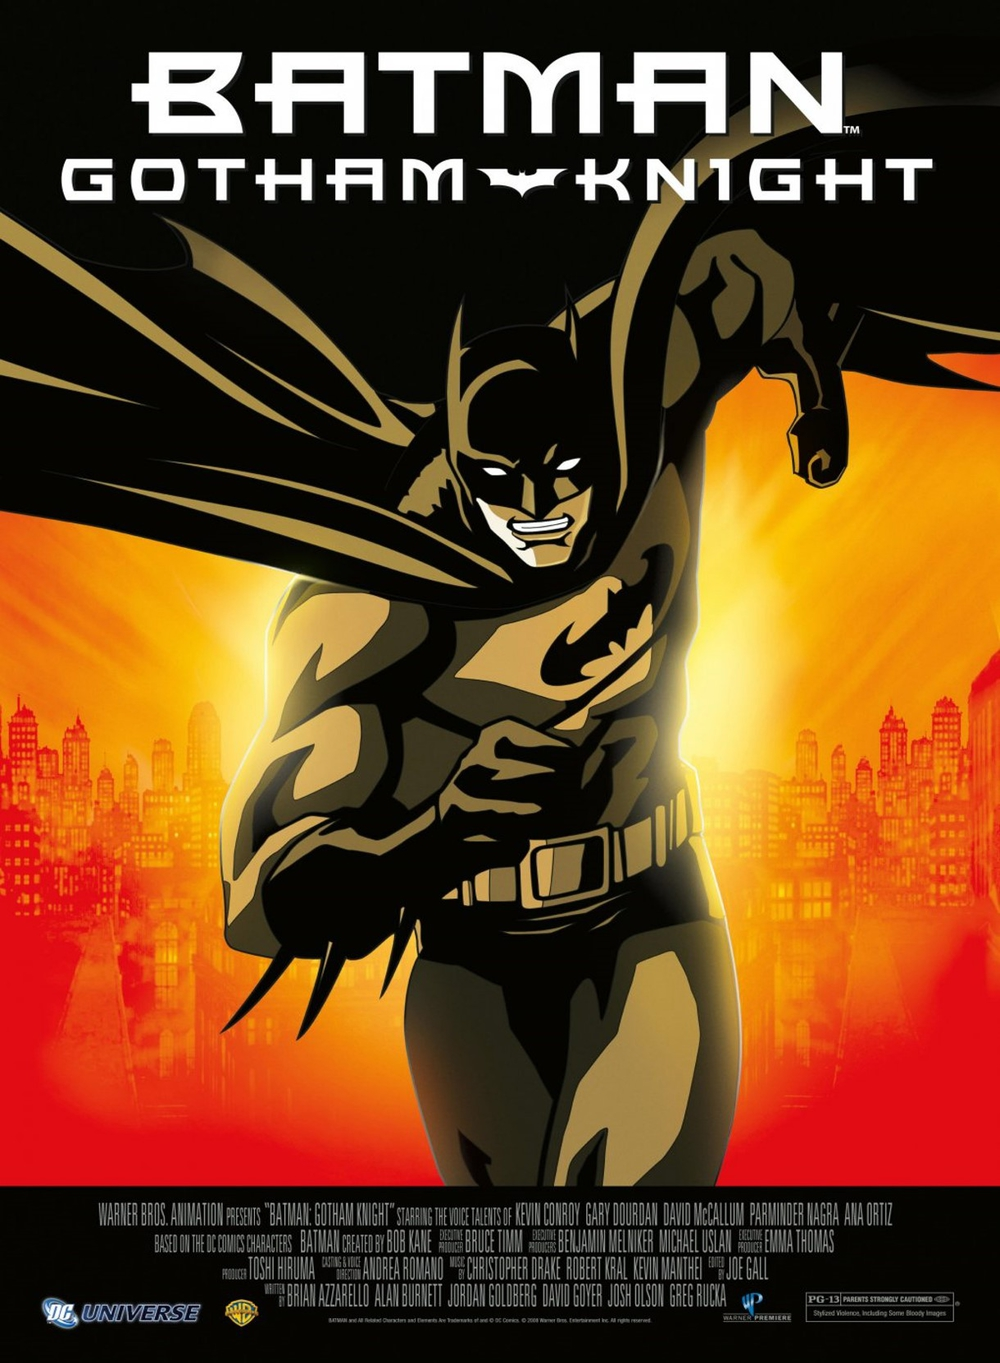 affiche du film Batman: Gotham Knight